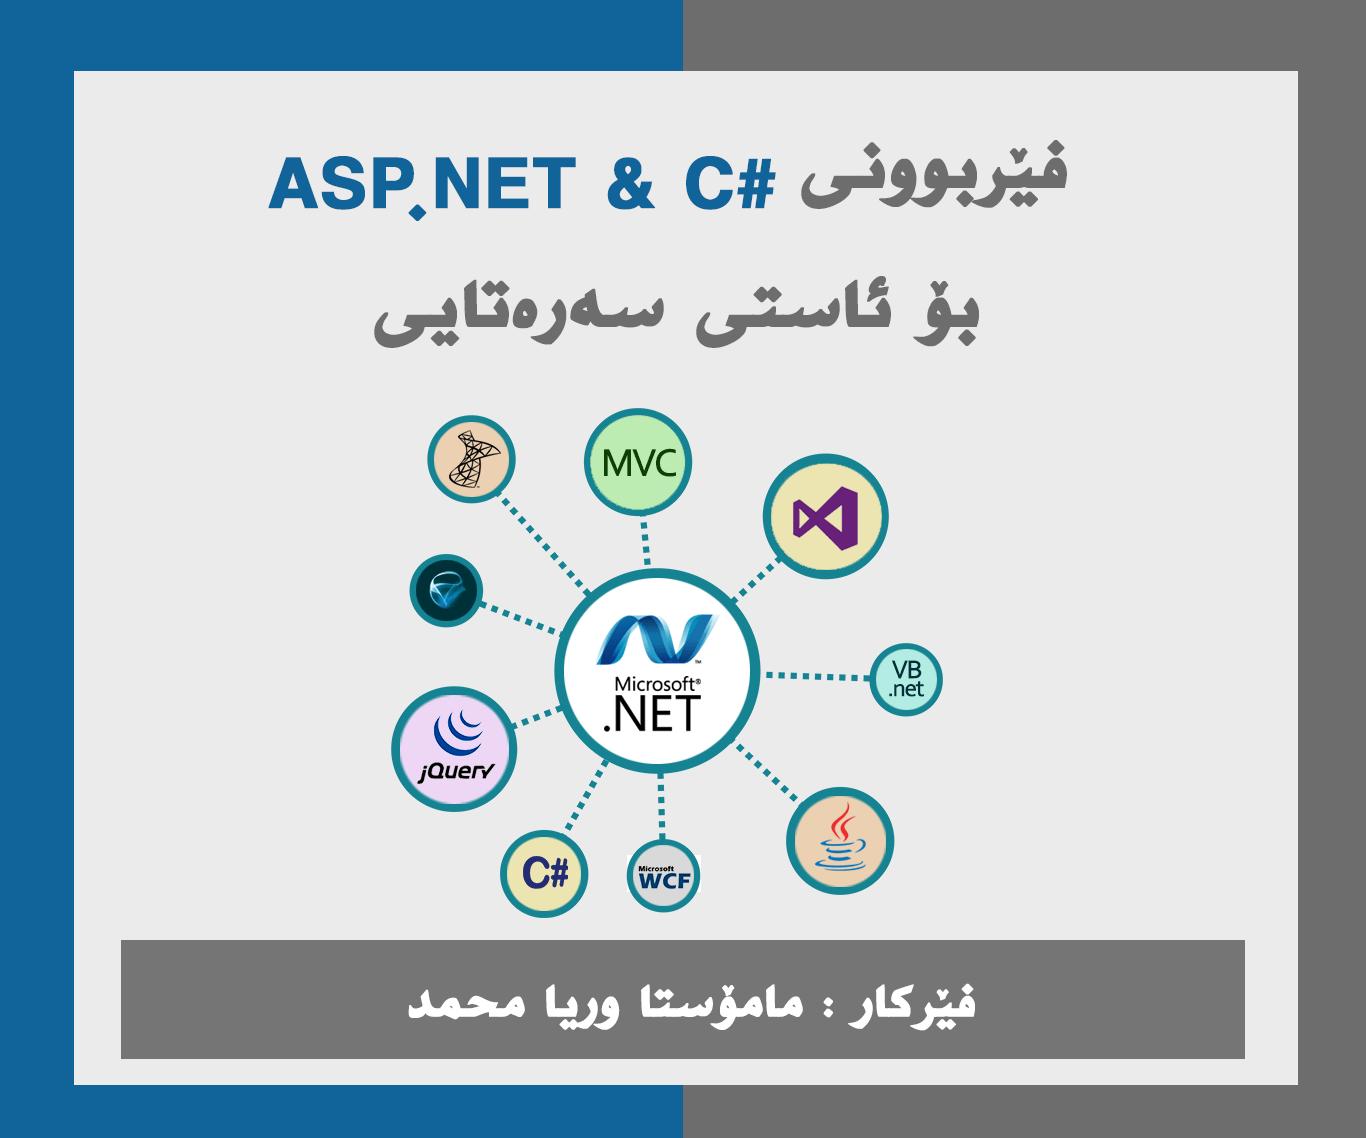 asp.net&c#